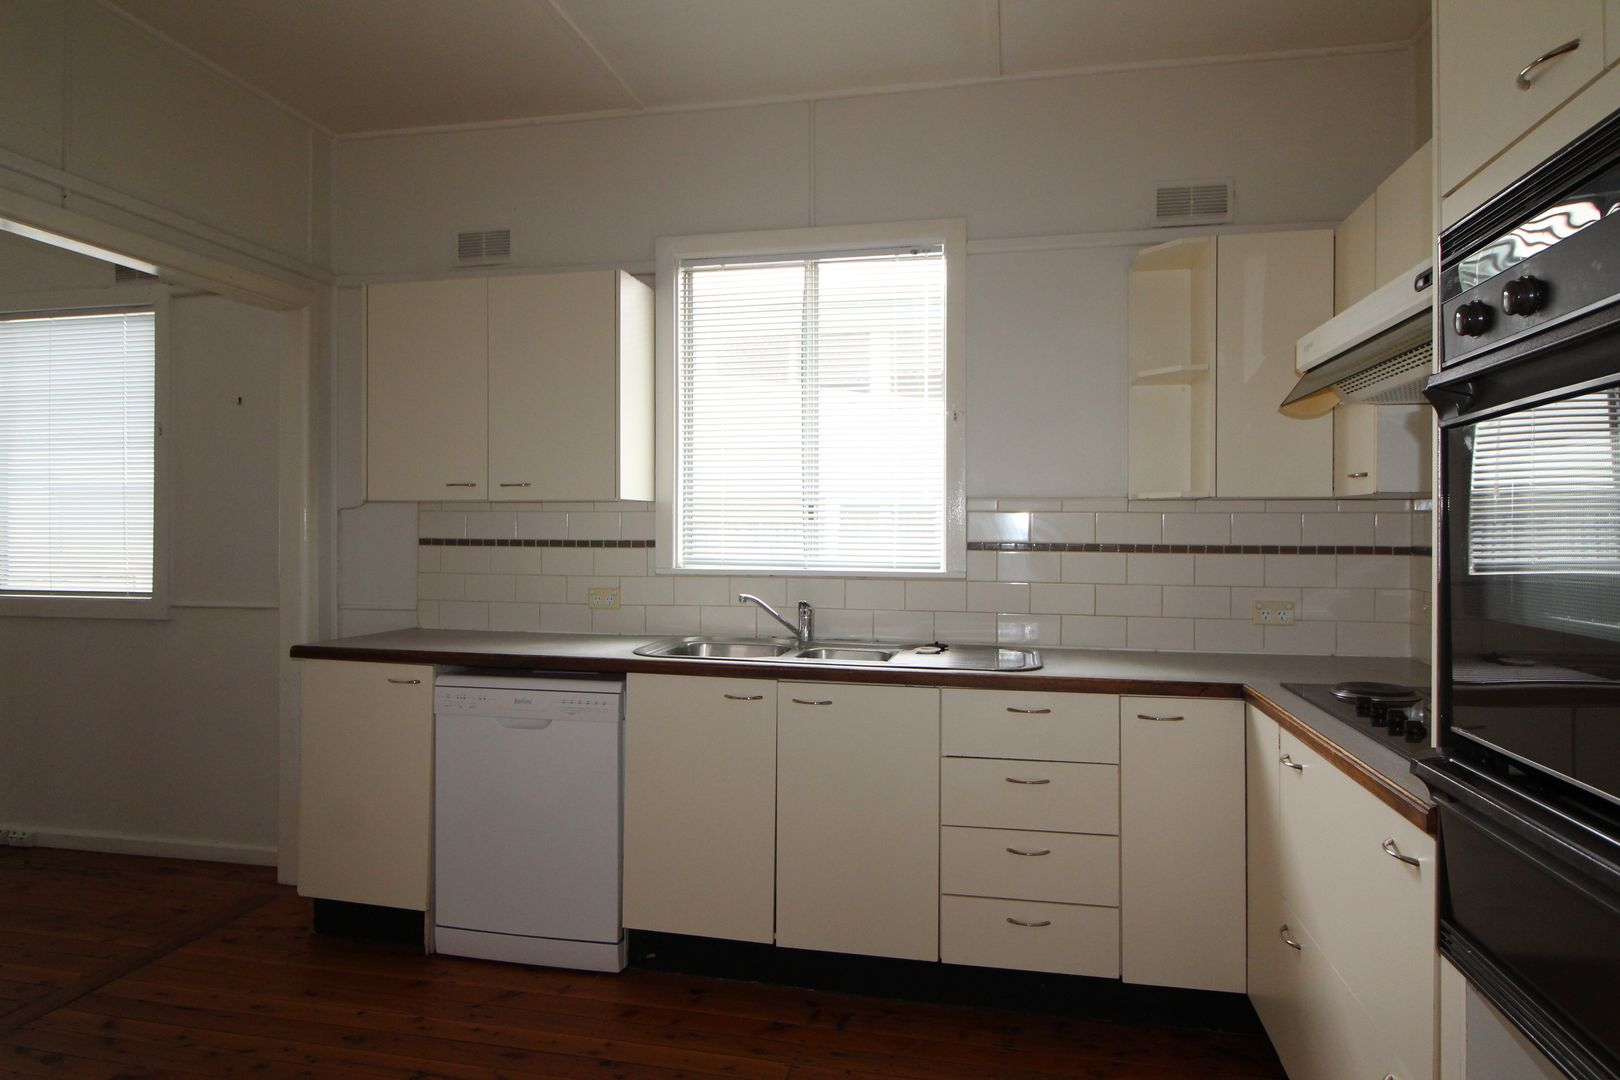 183 Trafalgar Ave, Umina Beach NSW 2257, Image 1